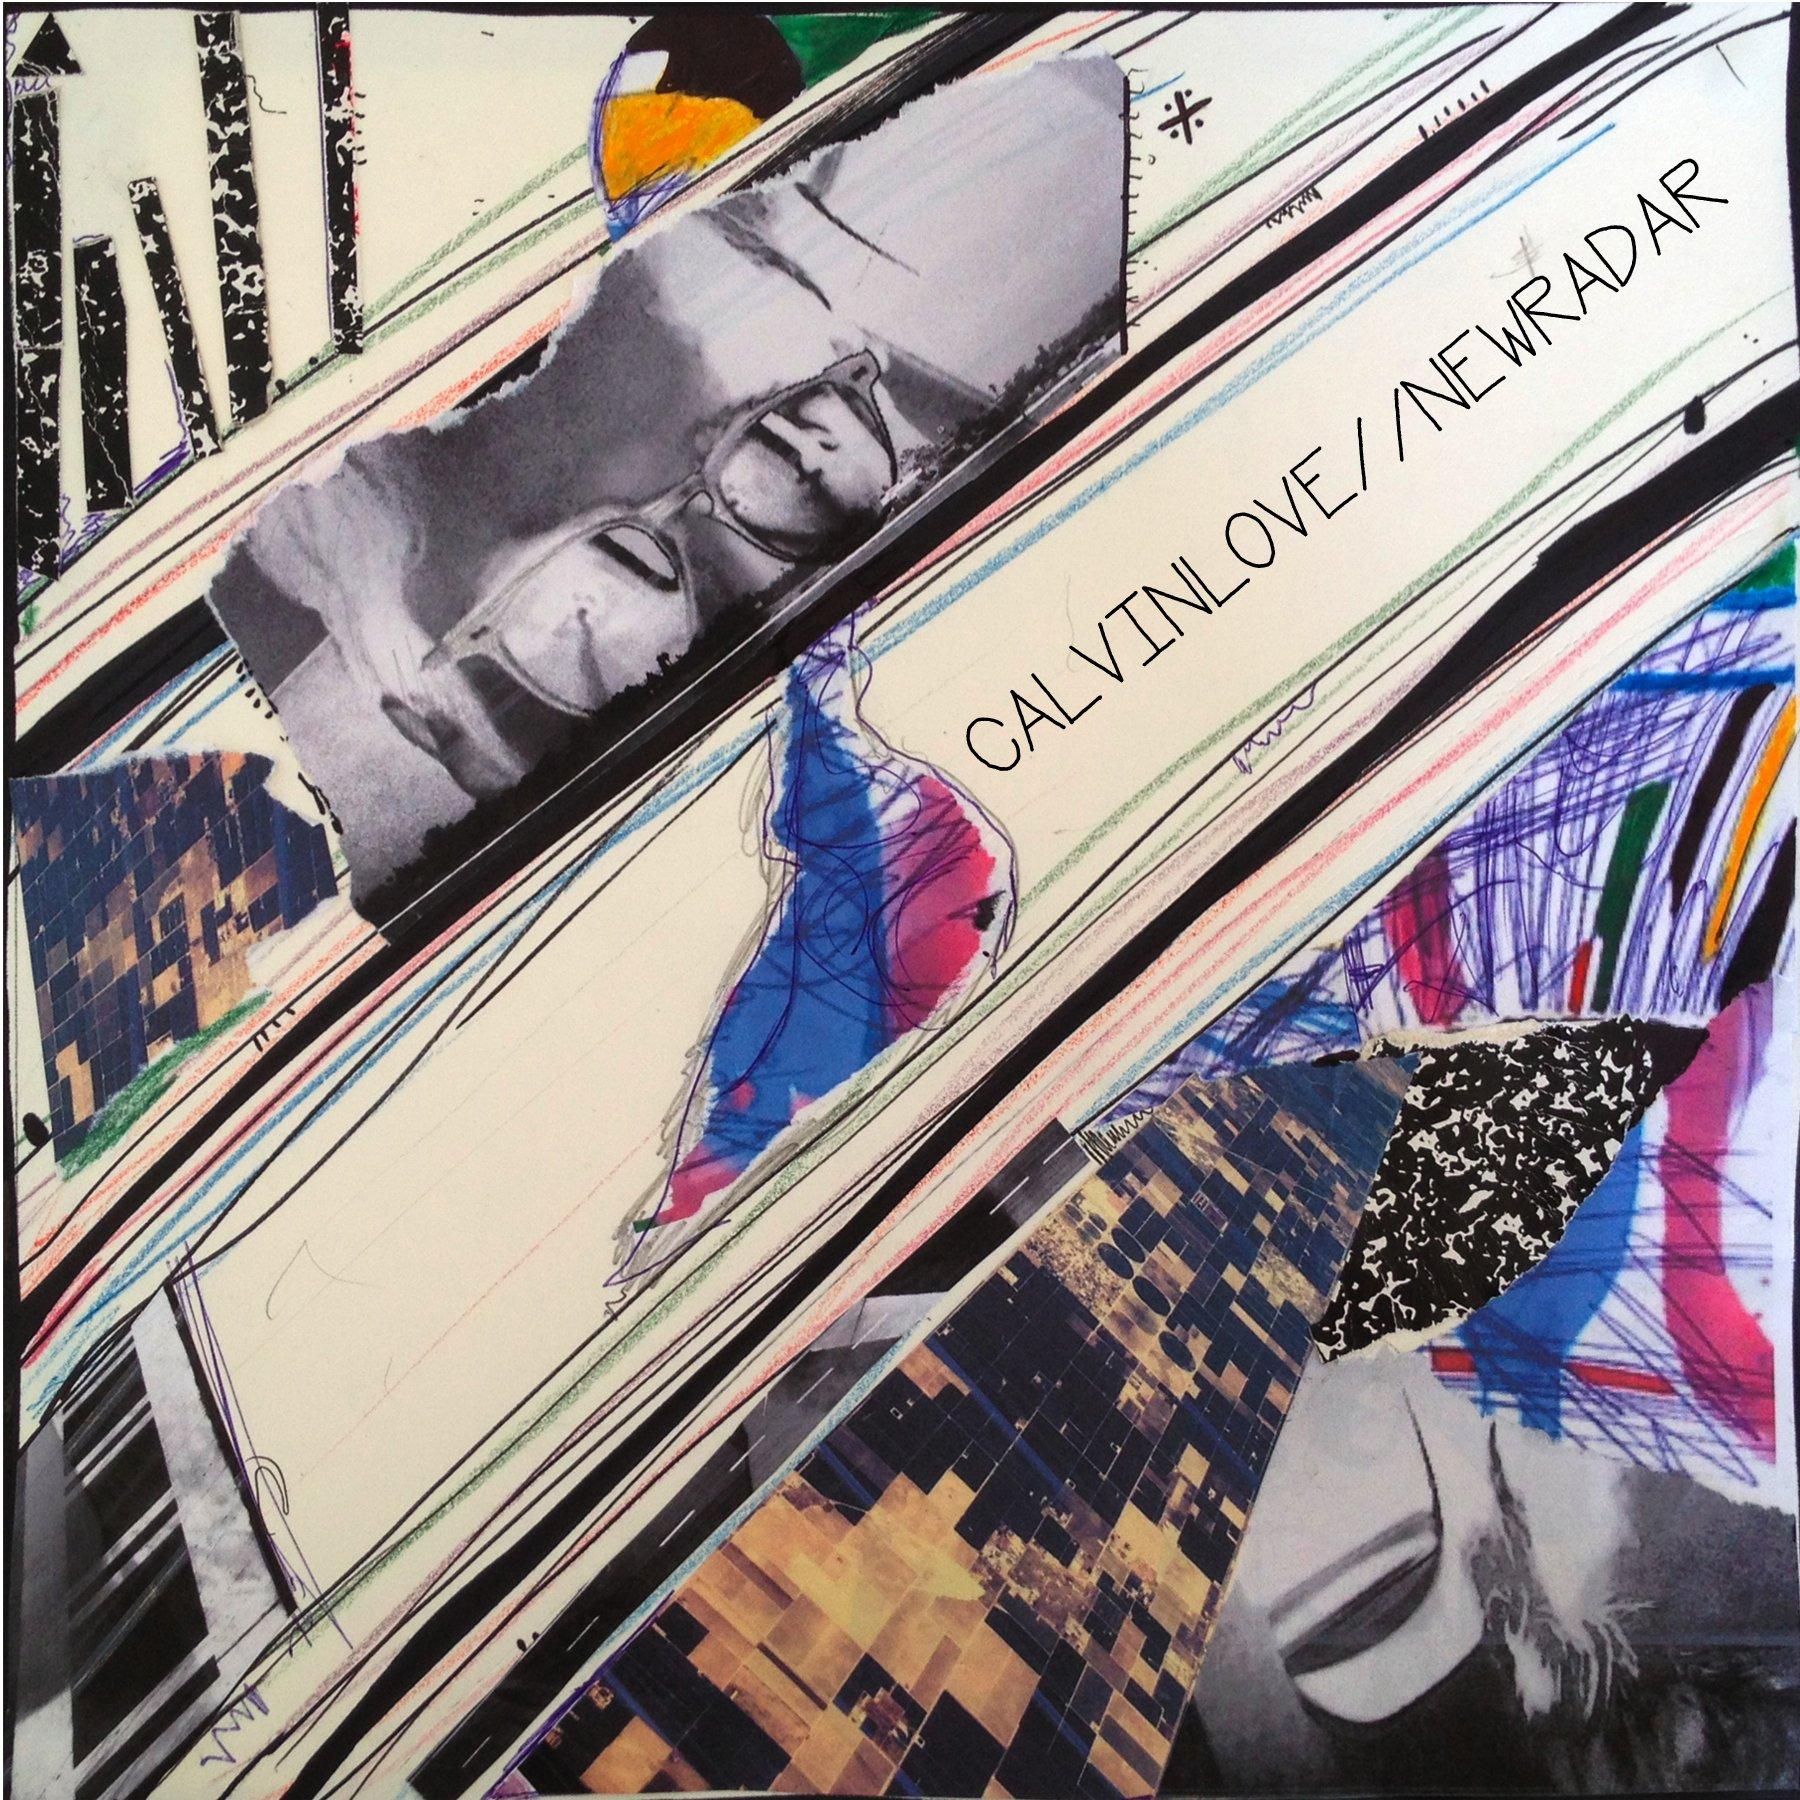 Calvin Love, New Radar, Autumn Tone Records.jpg